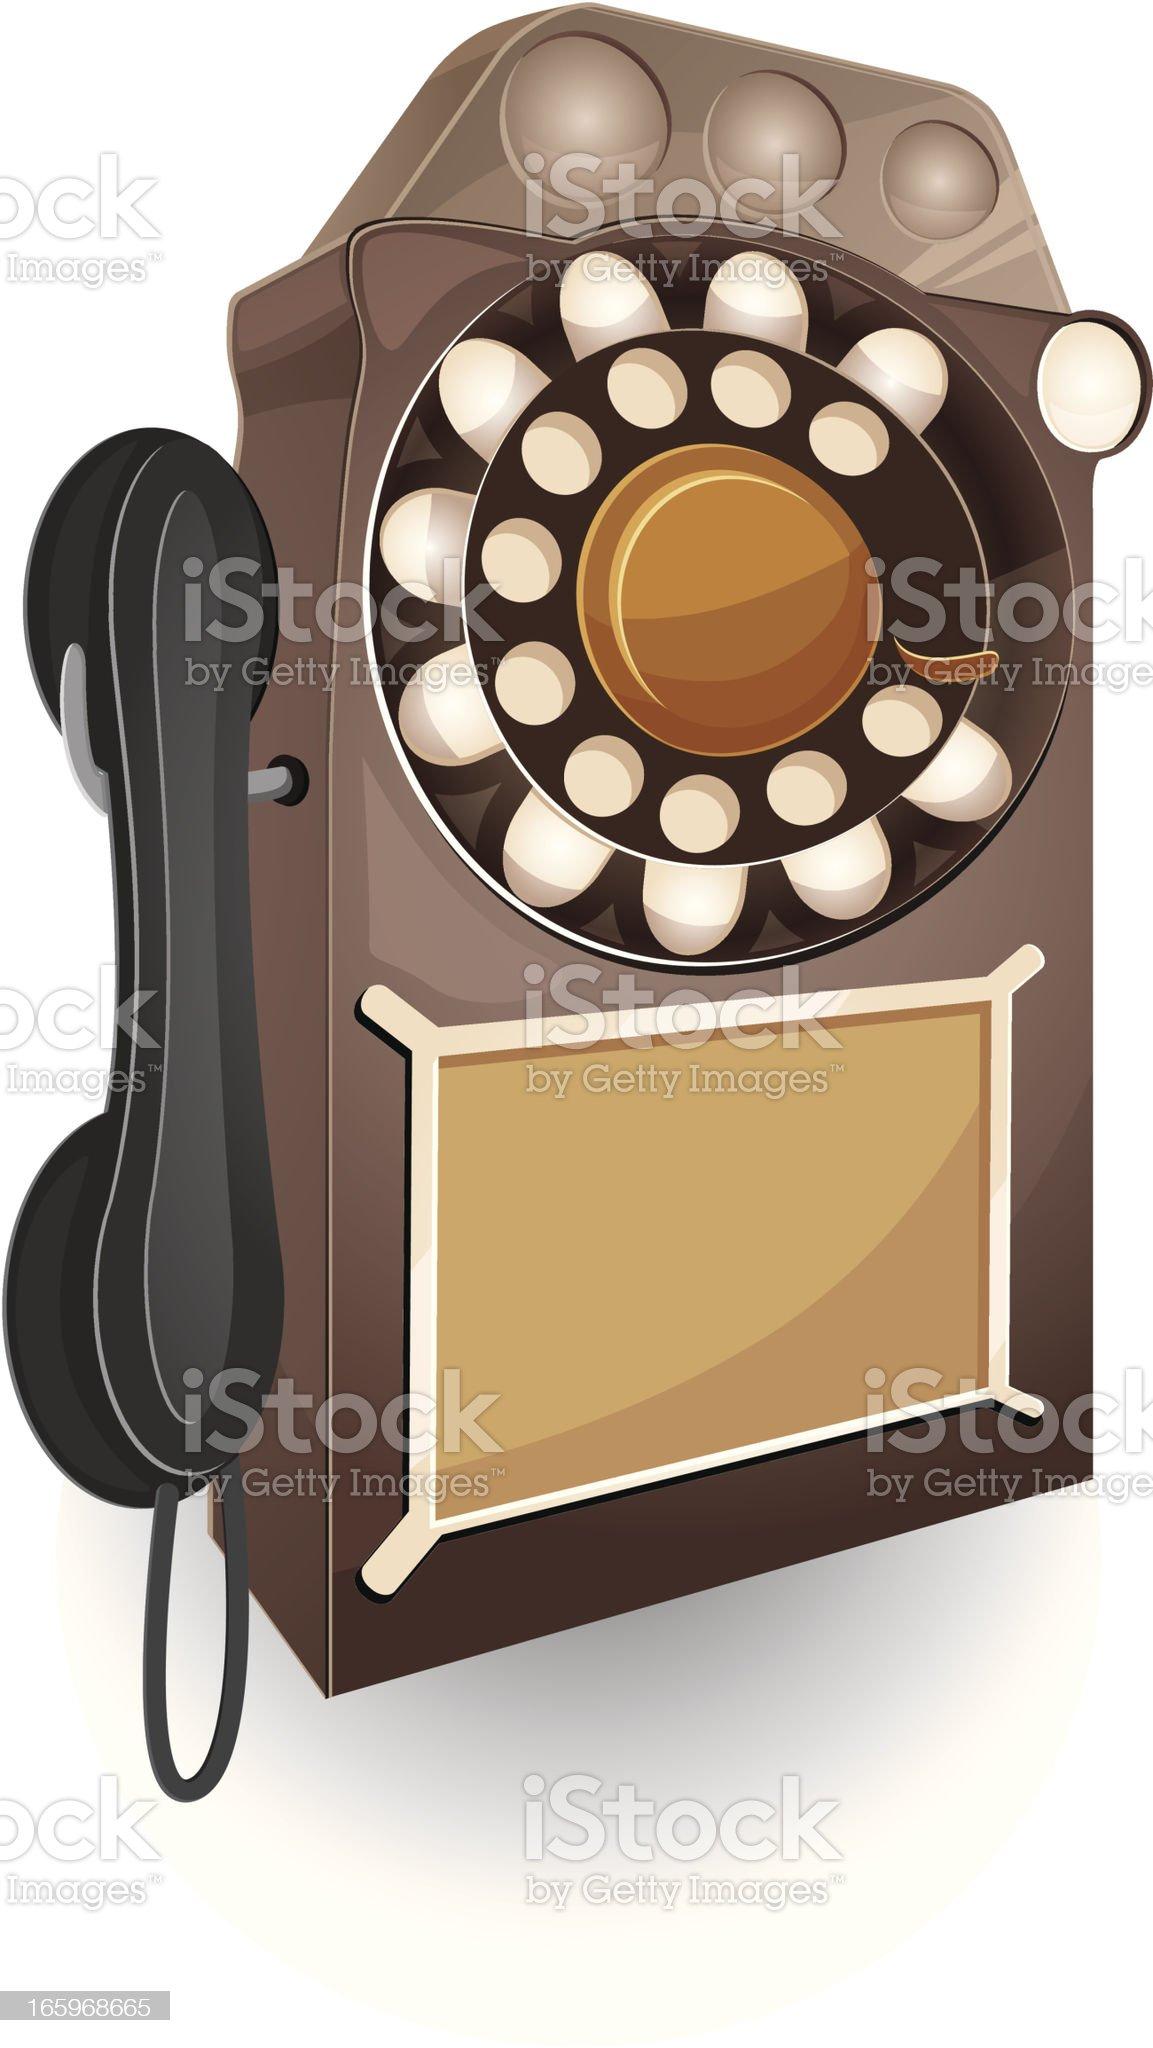 Retro public phone. royalty-free stock vector art